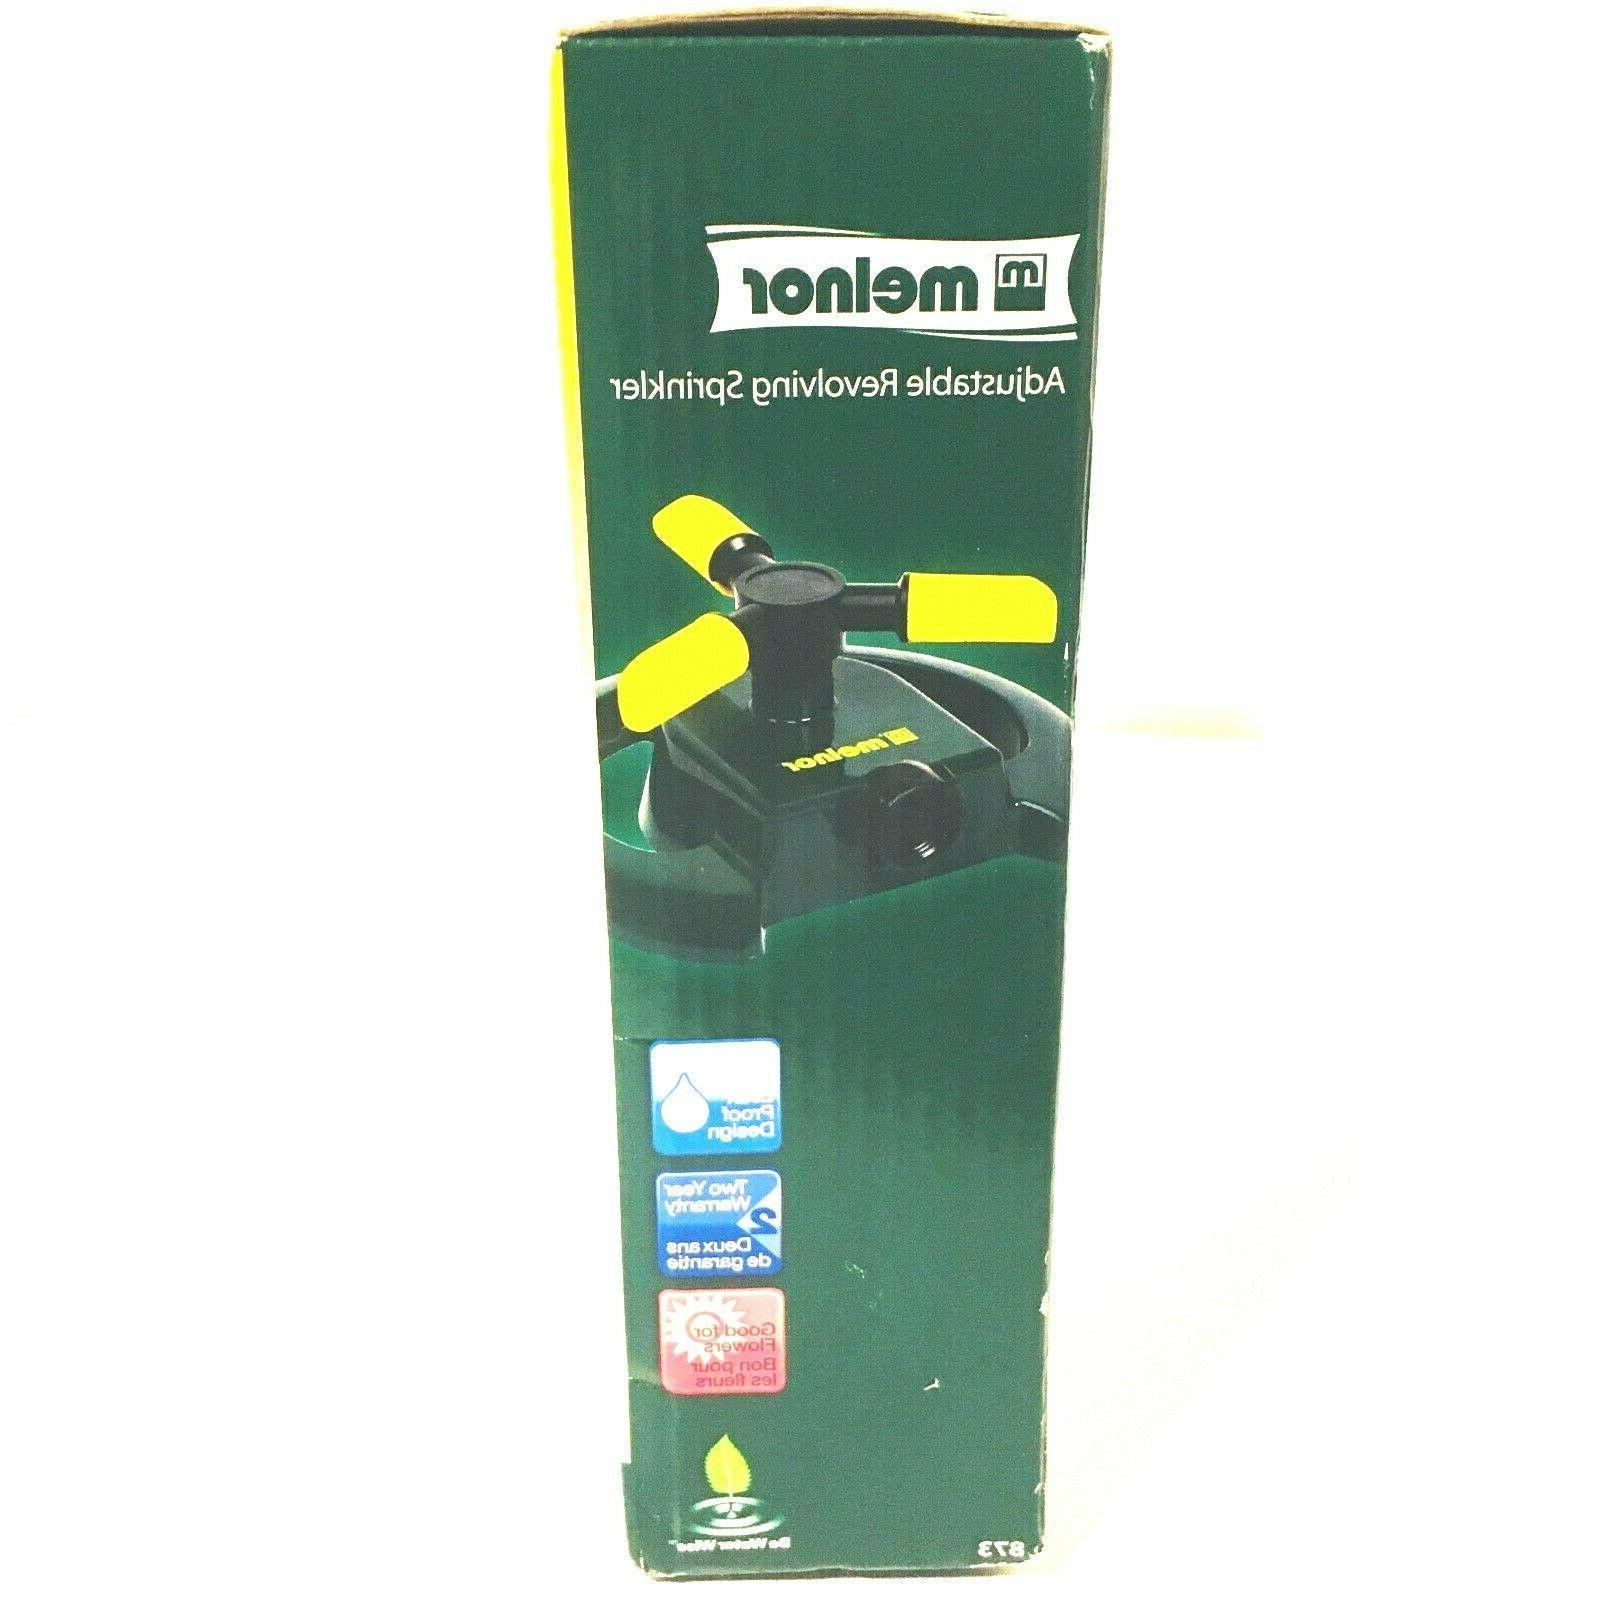 Melnor Lawn Sprinklers Up To 60' Diameter 3arm